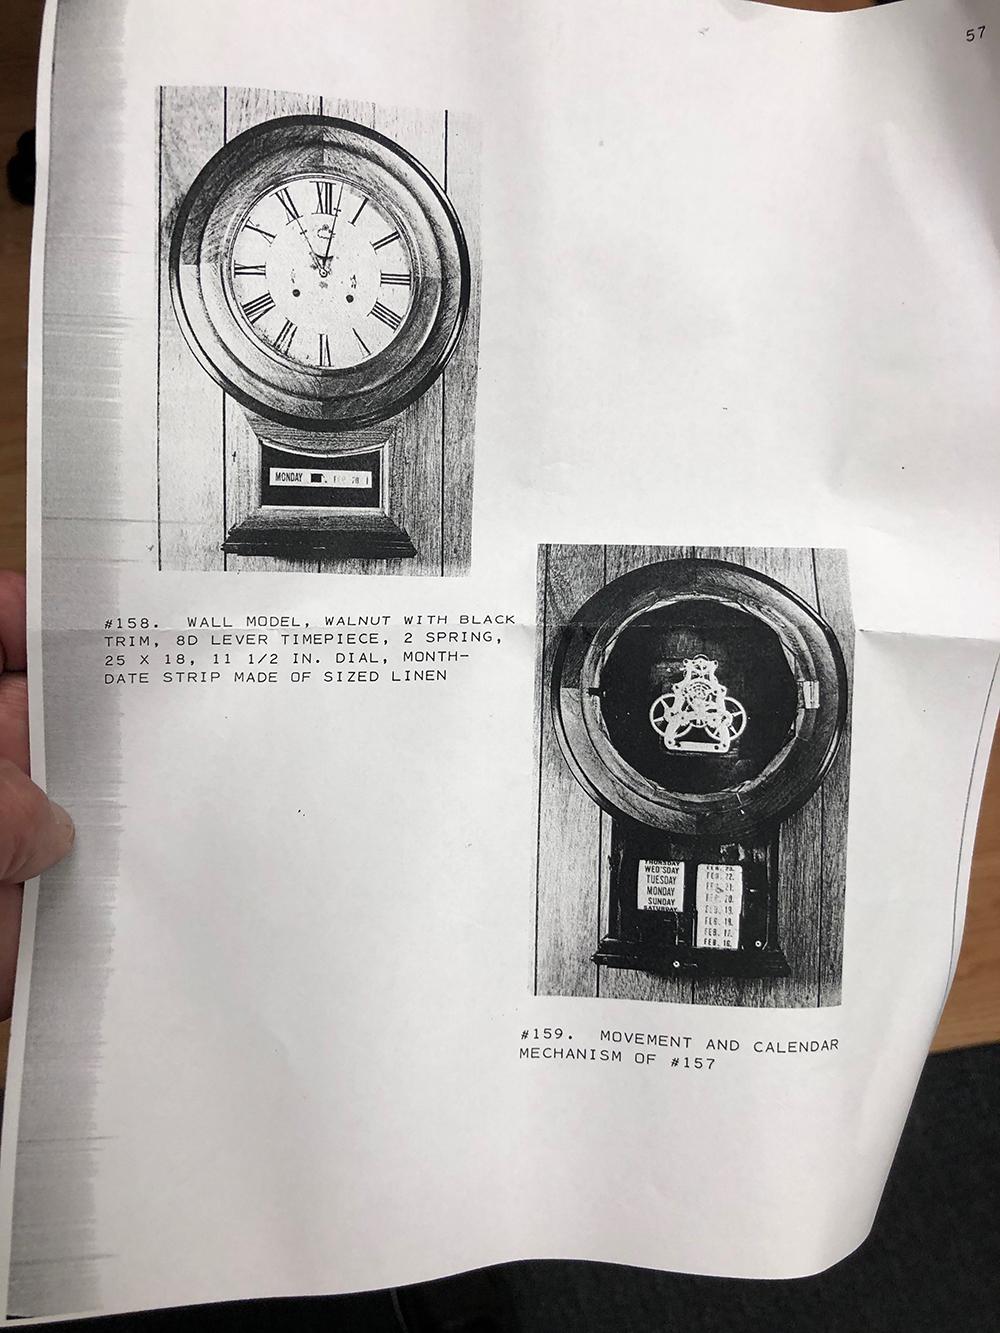 Lot 99: Very Rare Jerome Calendar Wall Clock